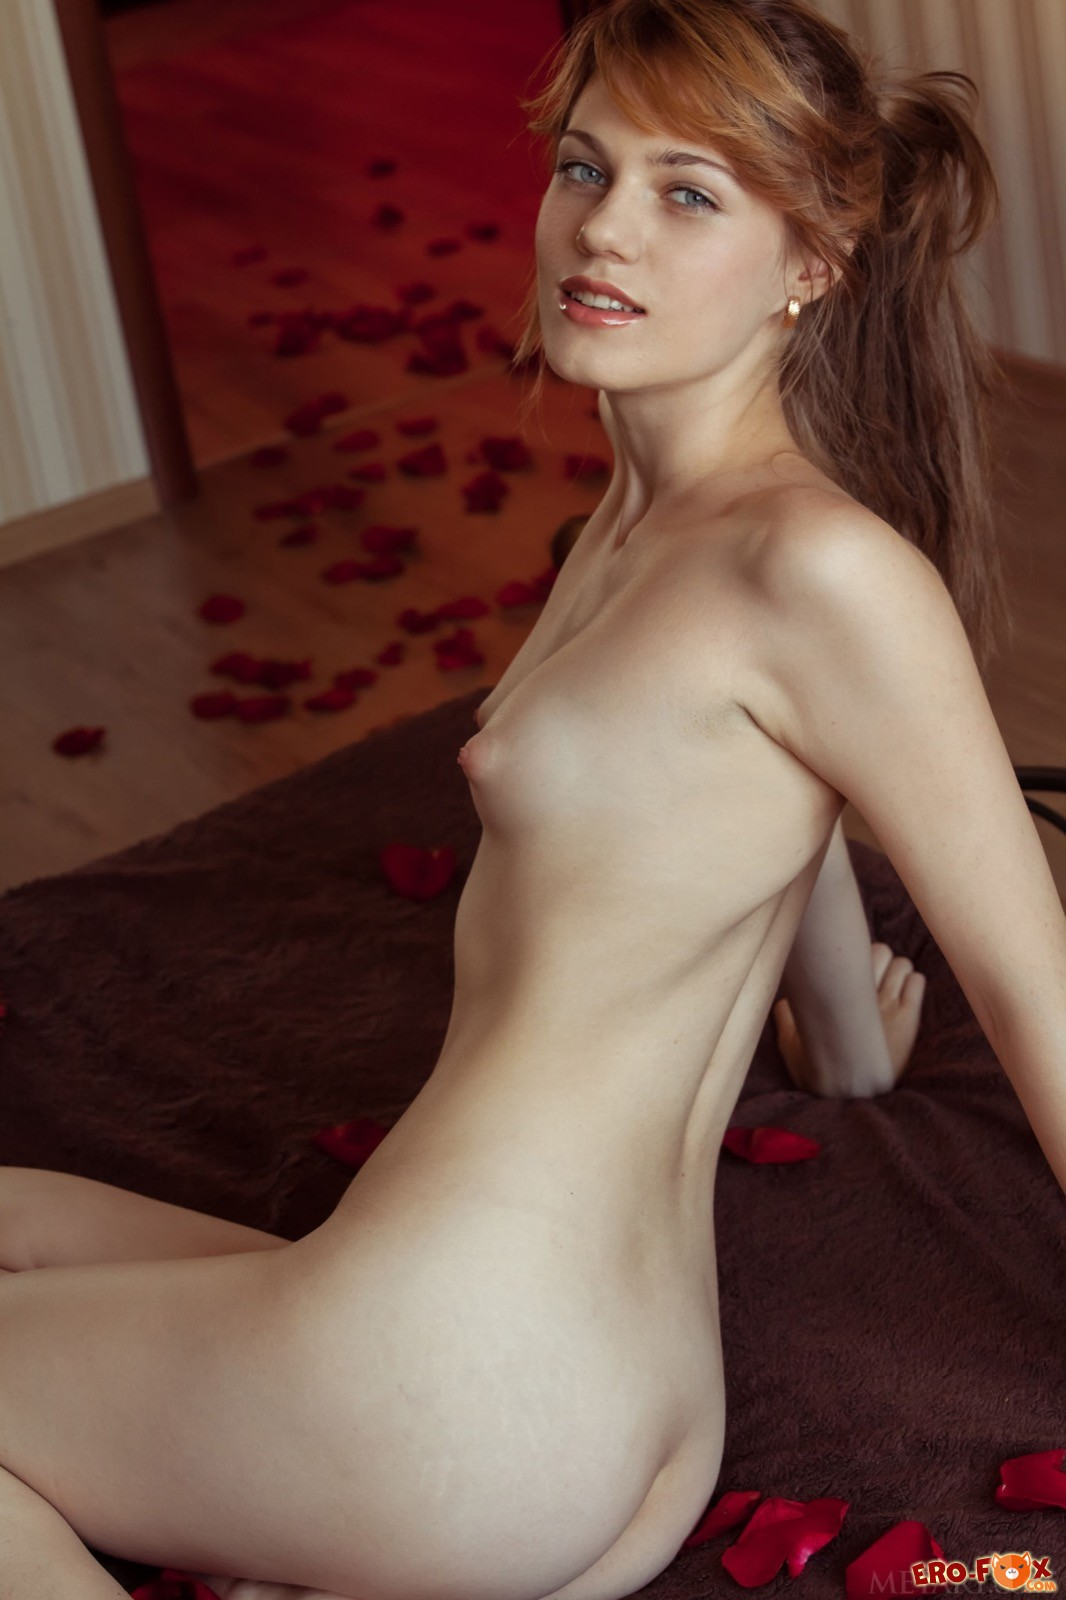 Девушка соблазнительно сняла трусики в постели